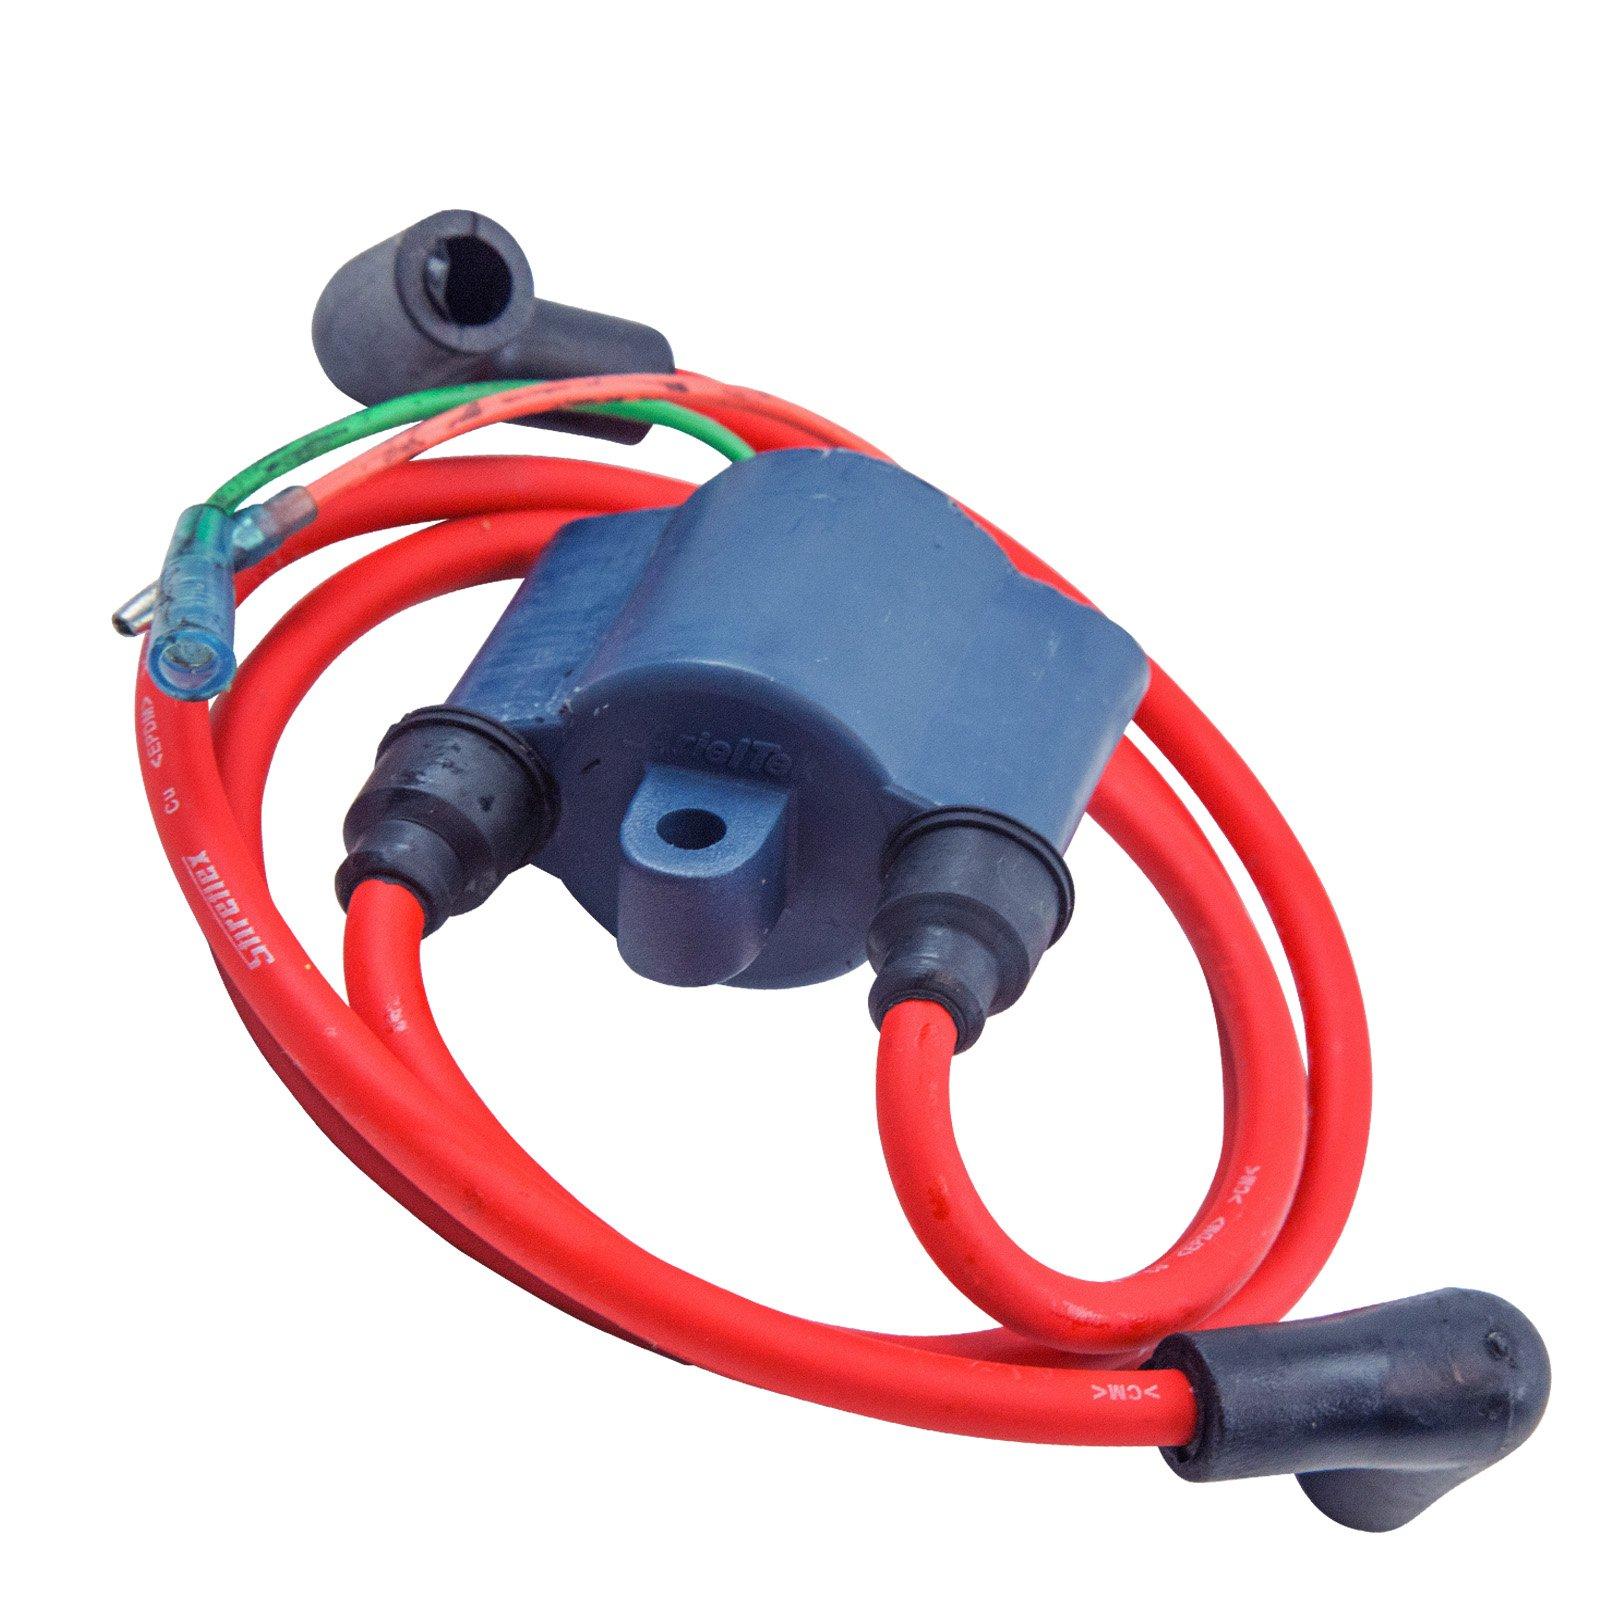 Compatible With Yamaha Ignition Coil 62E / 61L-85570-00-00 650 700 701 VXR Super Jet Wave Blaster Runner Raider by Jet Ski Plus